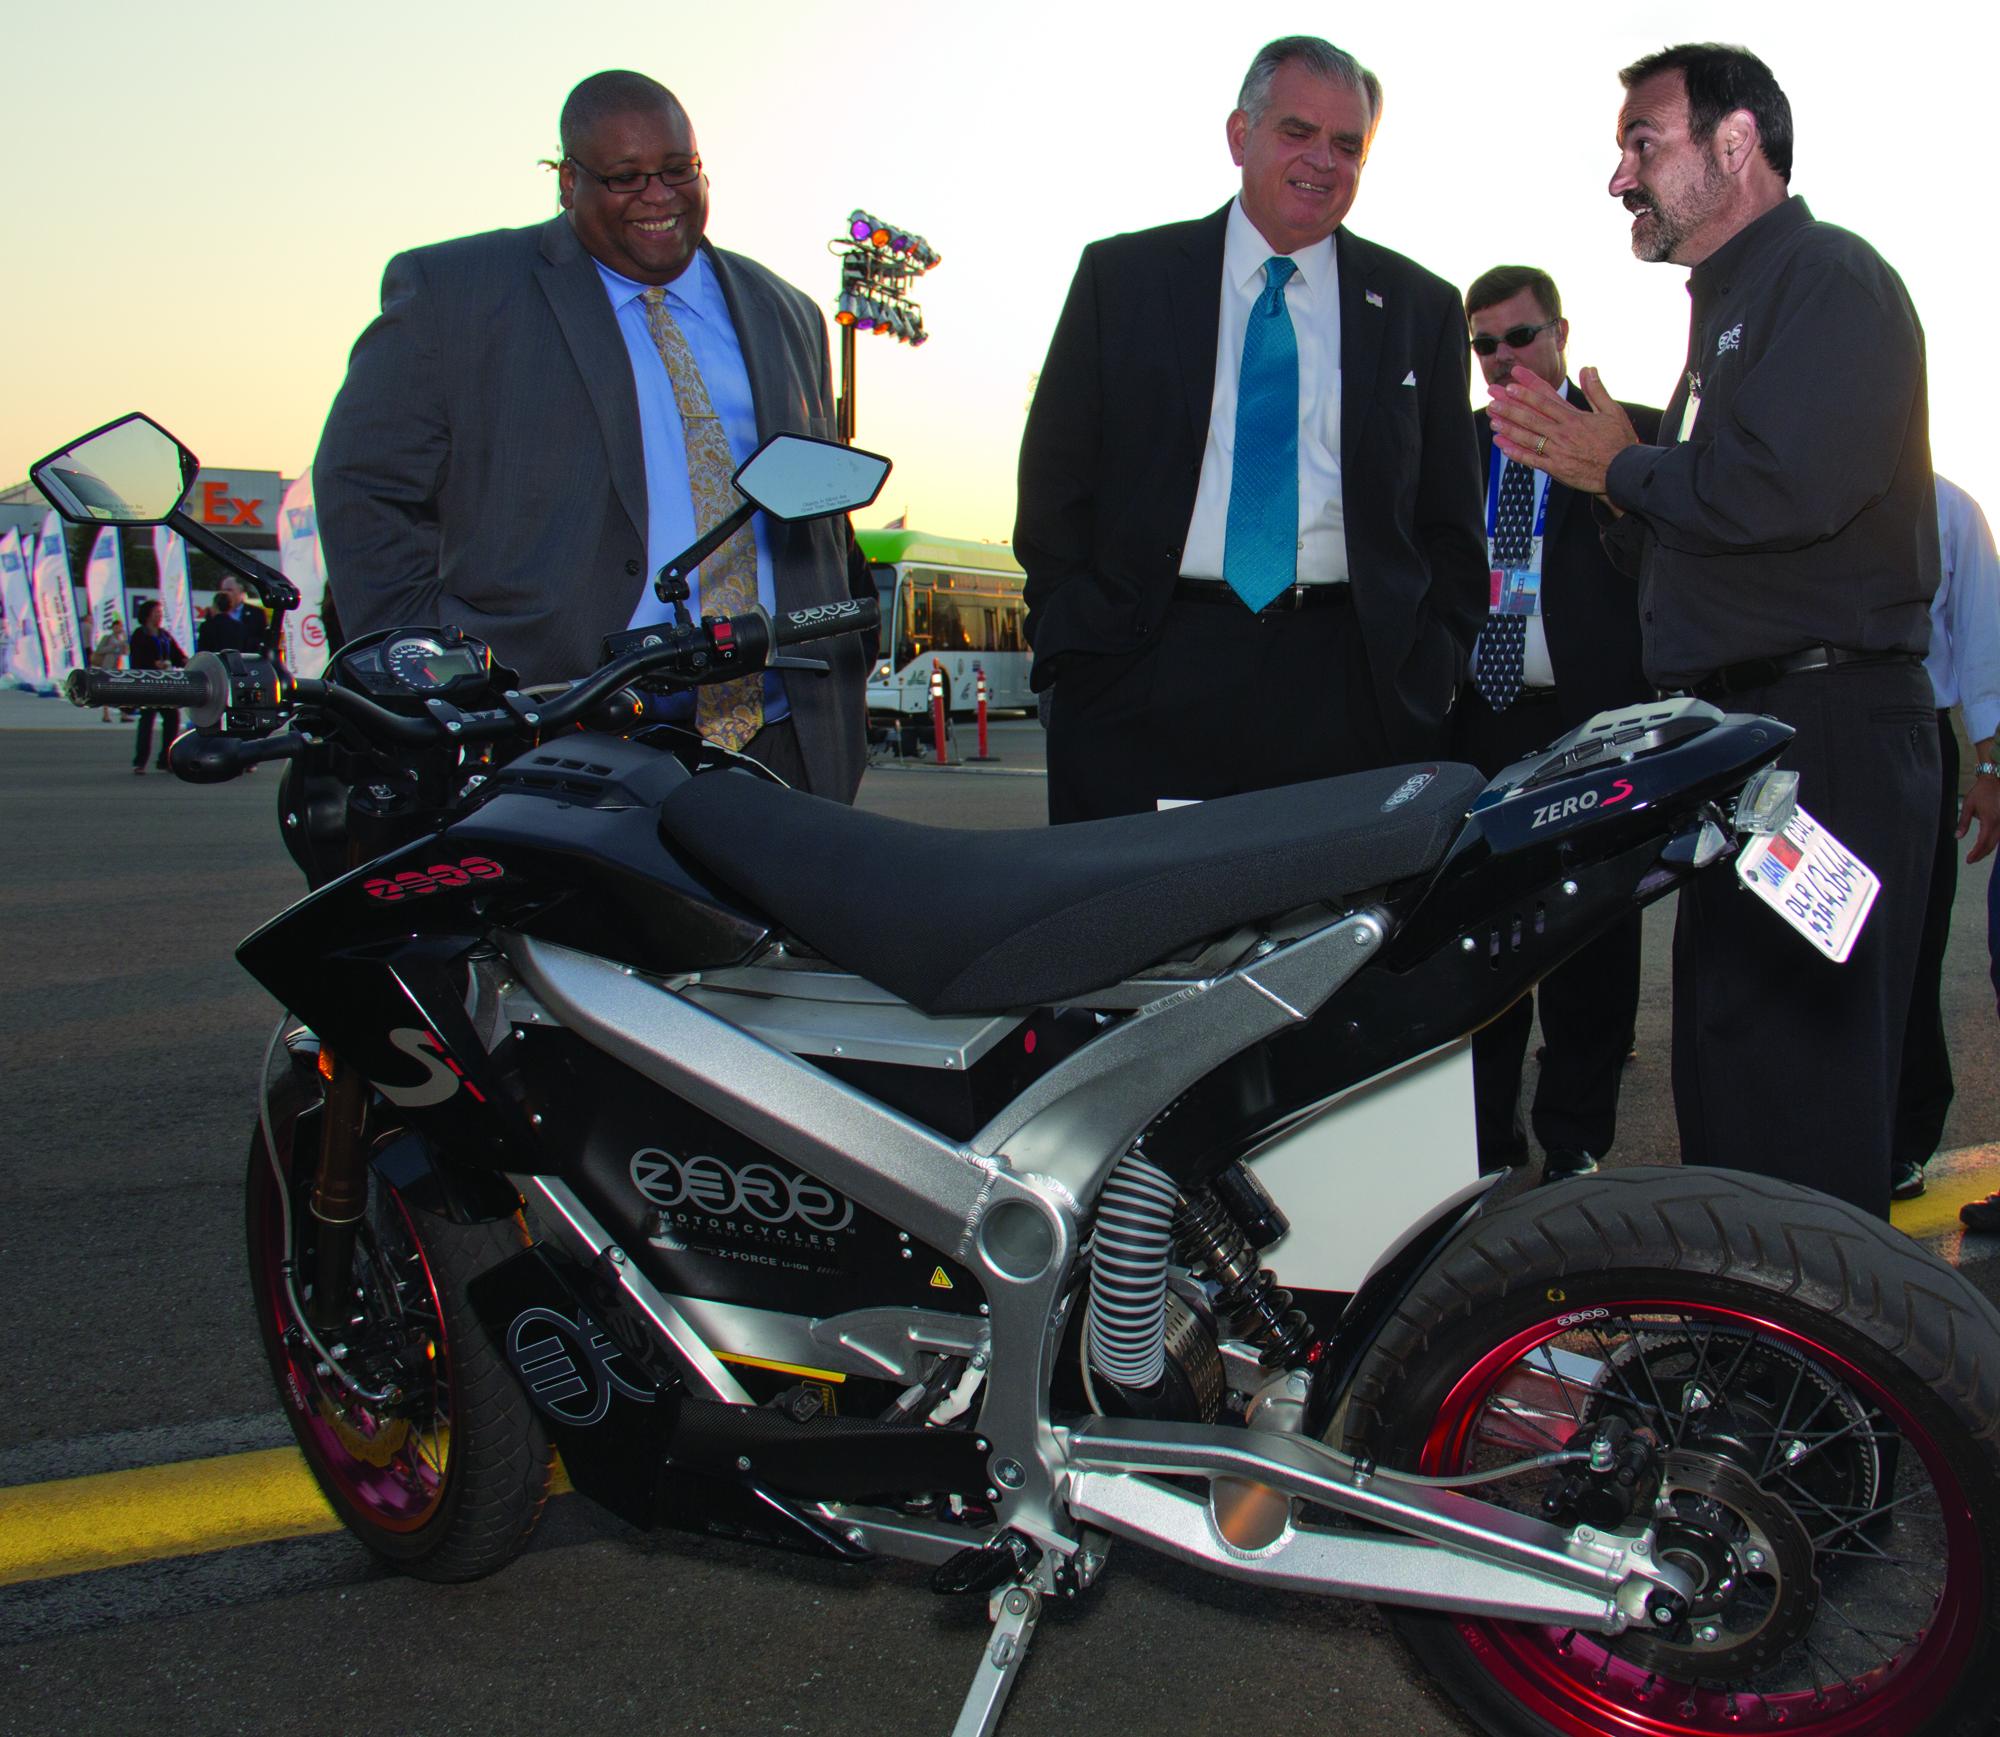 2011 - U.S. Secretary of Transportation Ray LaHood viewing Zero S Motorcycle